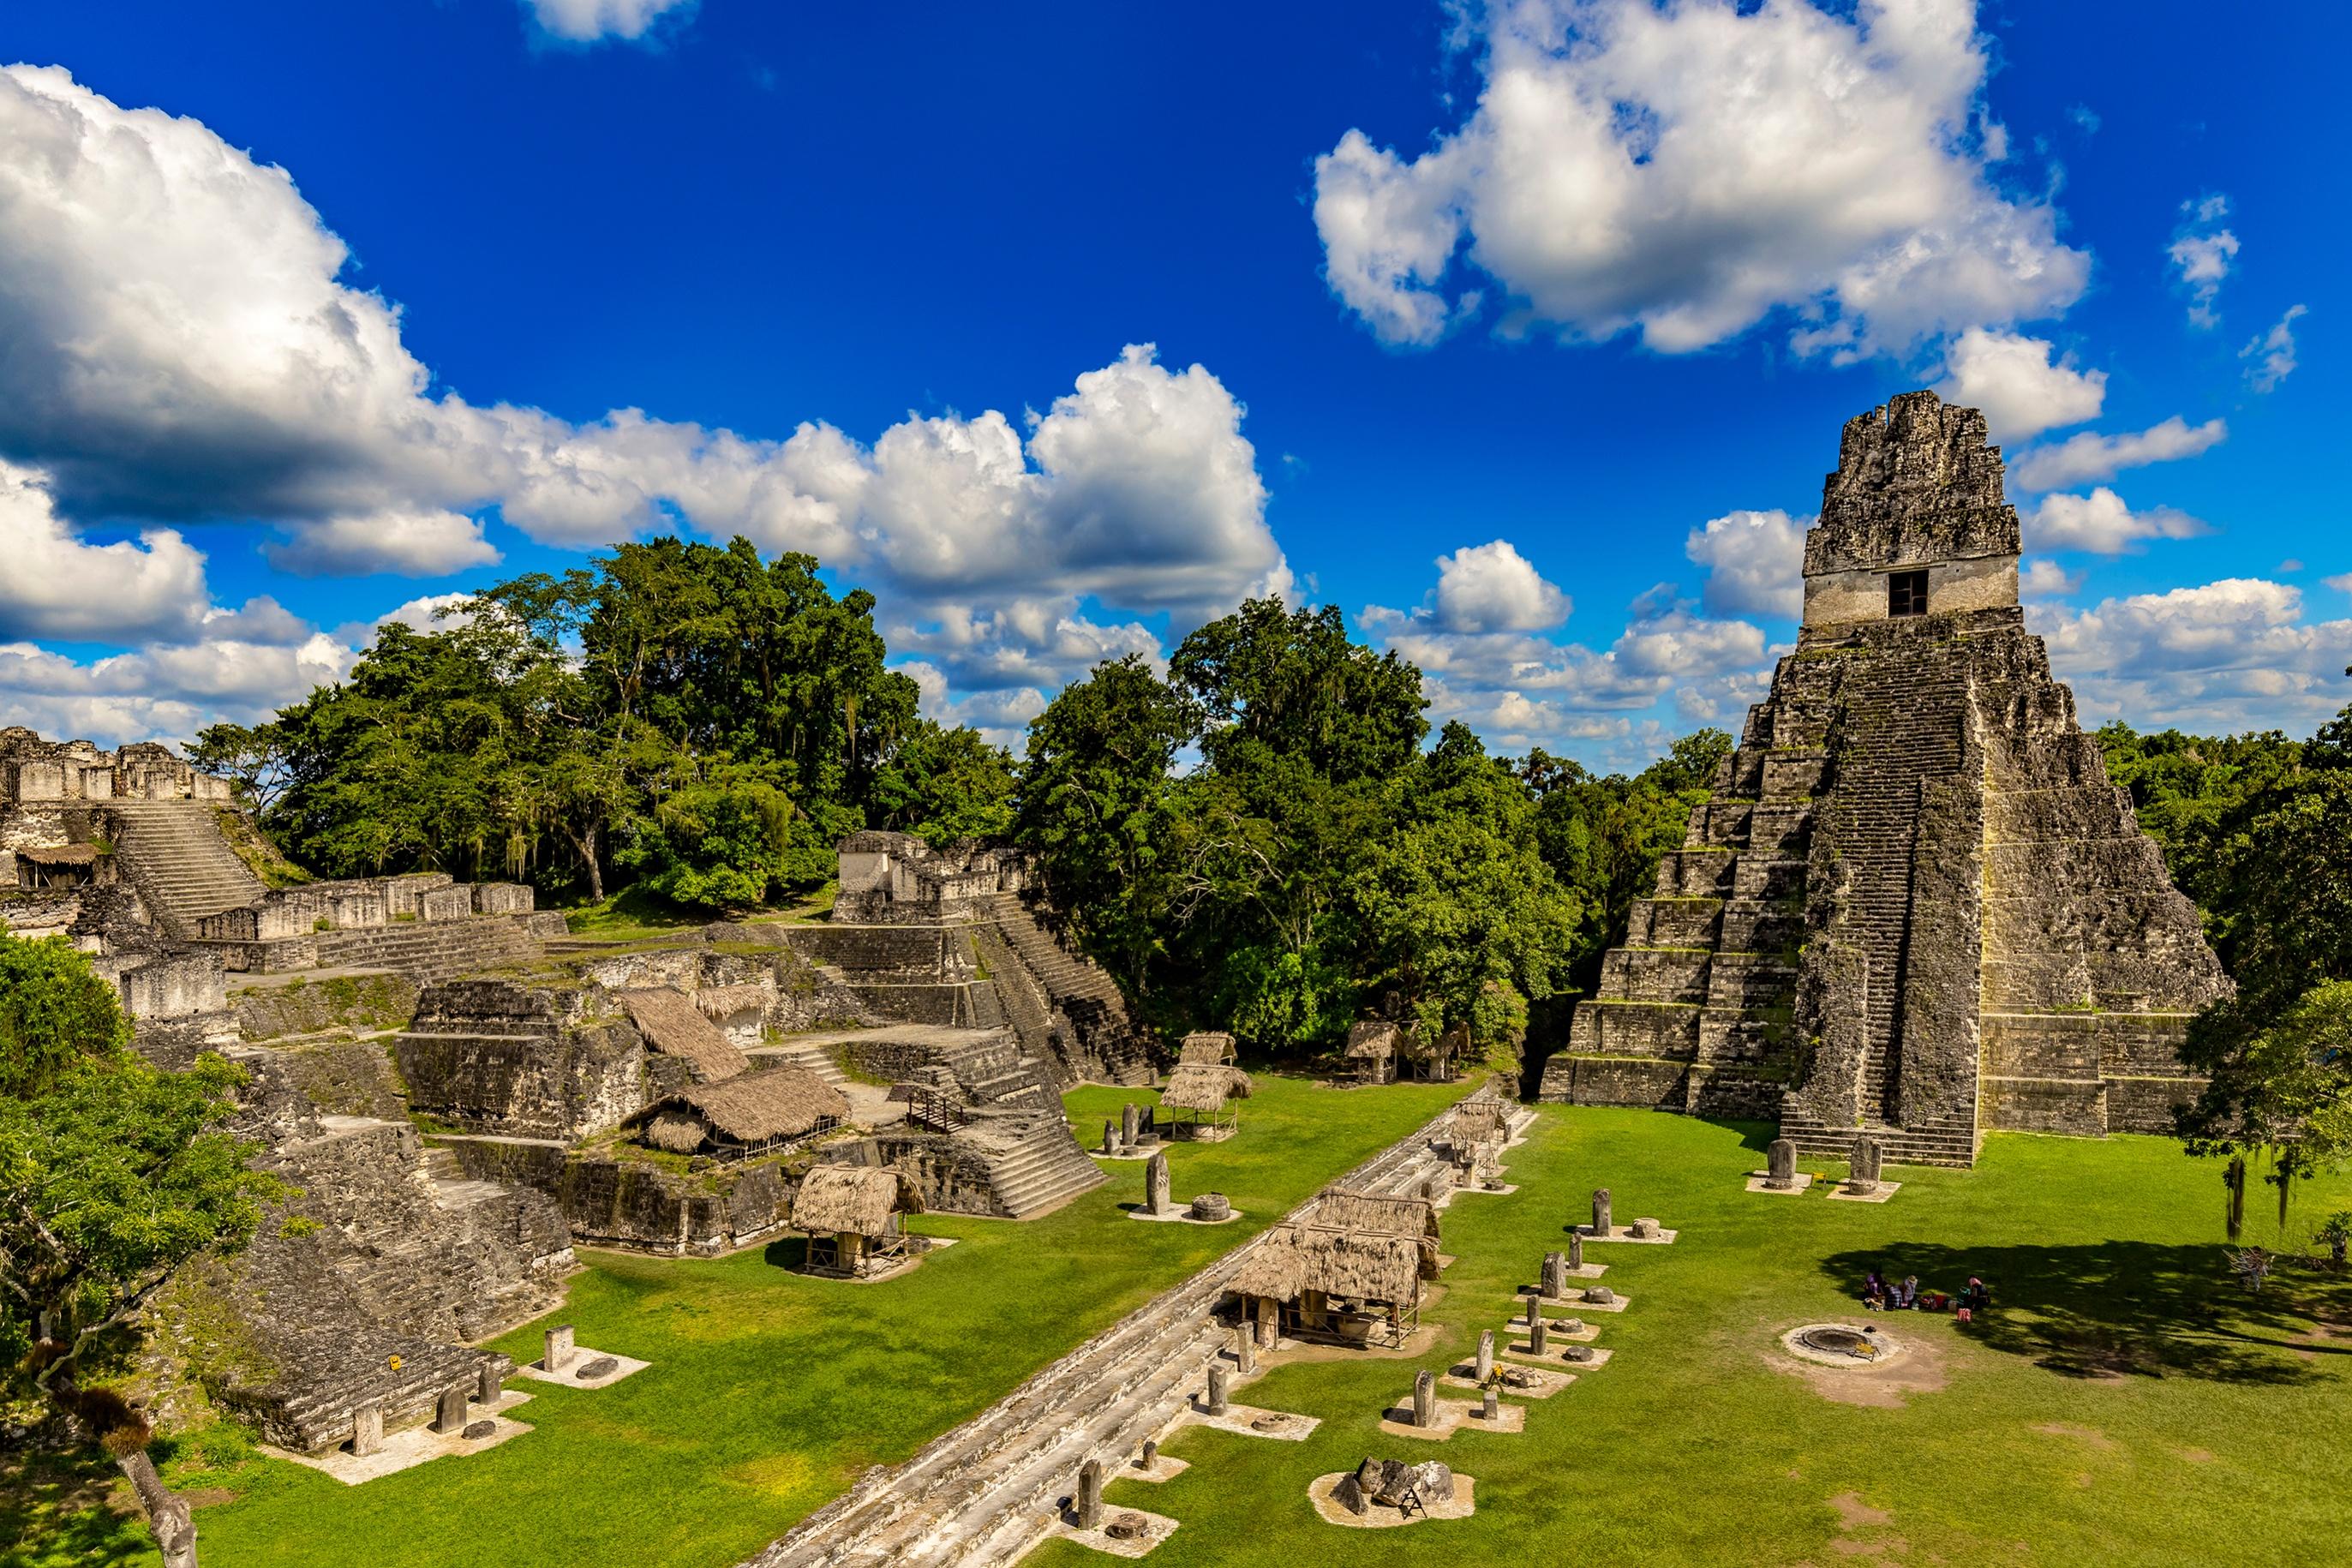 Nom : Parc National Tikal PVT Guatemala.jpg Affichages : 192 Taille : 2,31 Mo